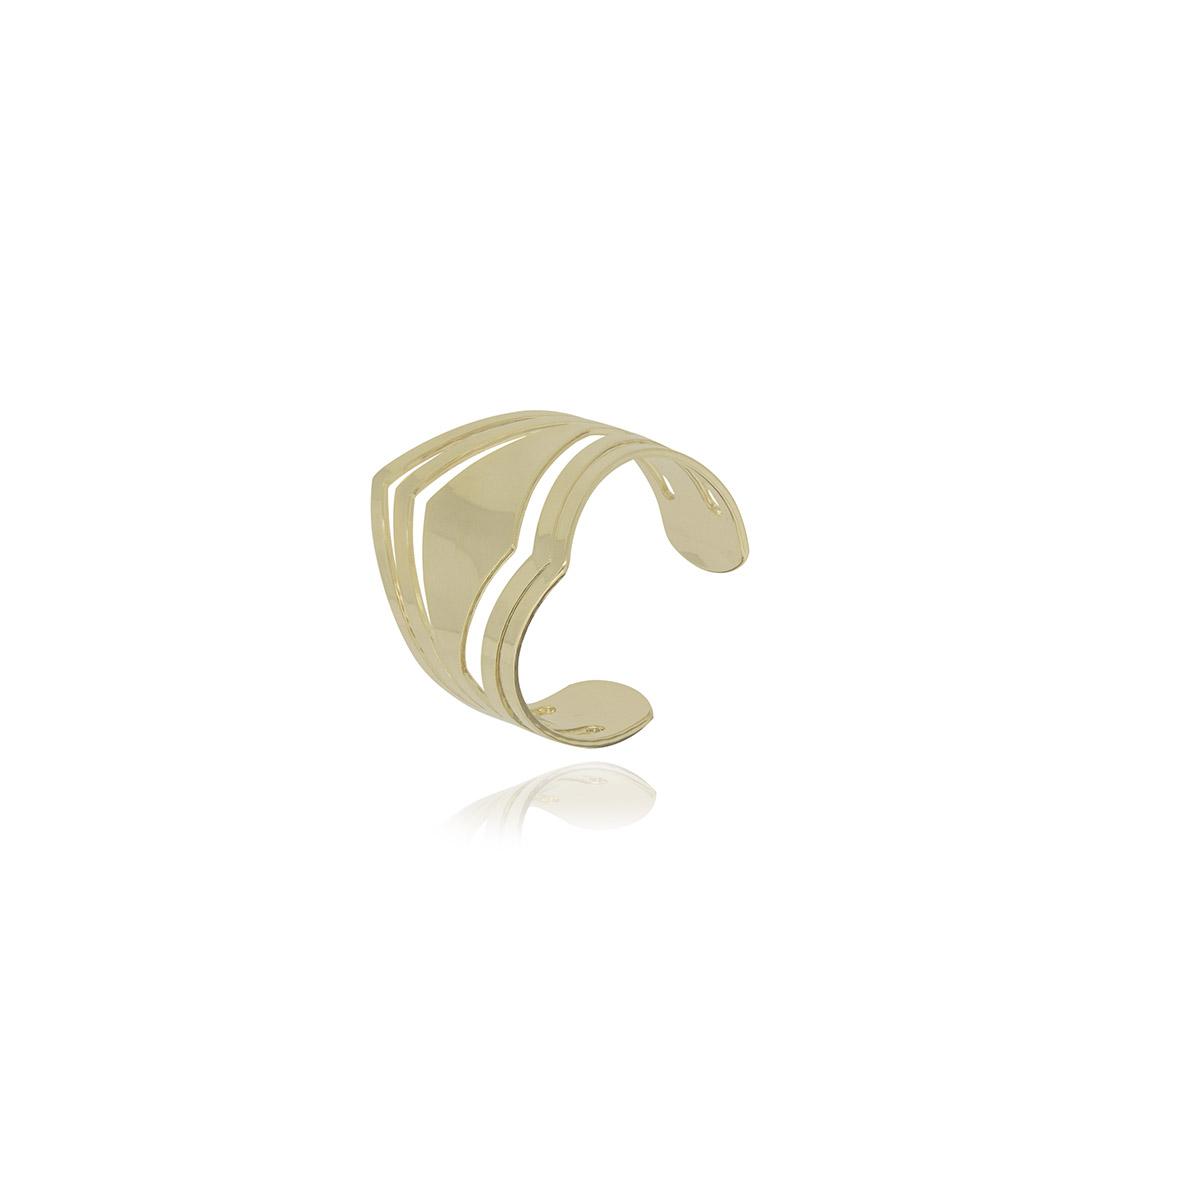 Piercing semijoia Ponta vazada folheado a ouro 18k ou ródio